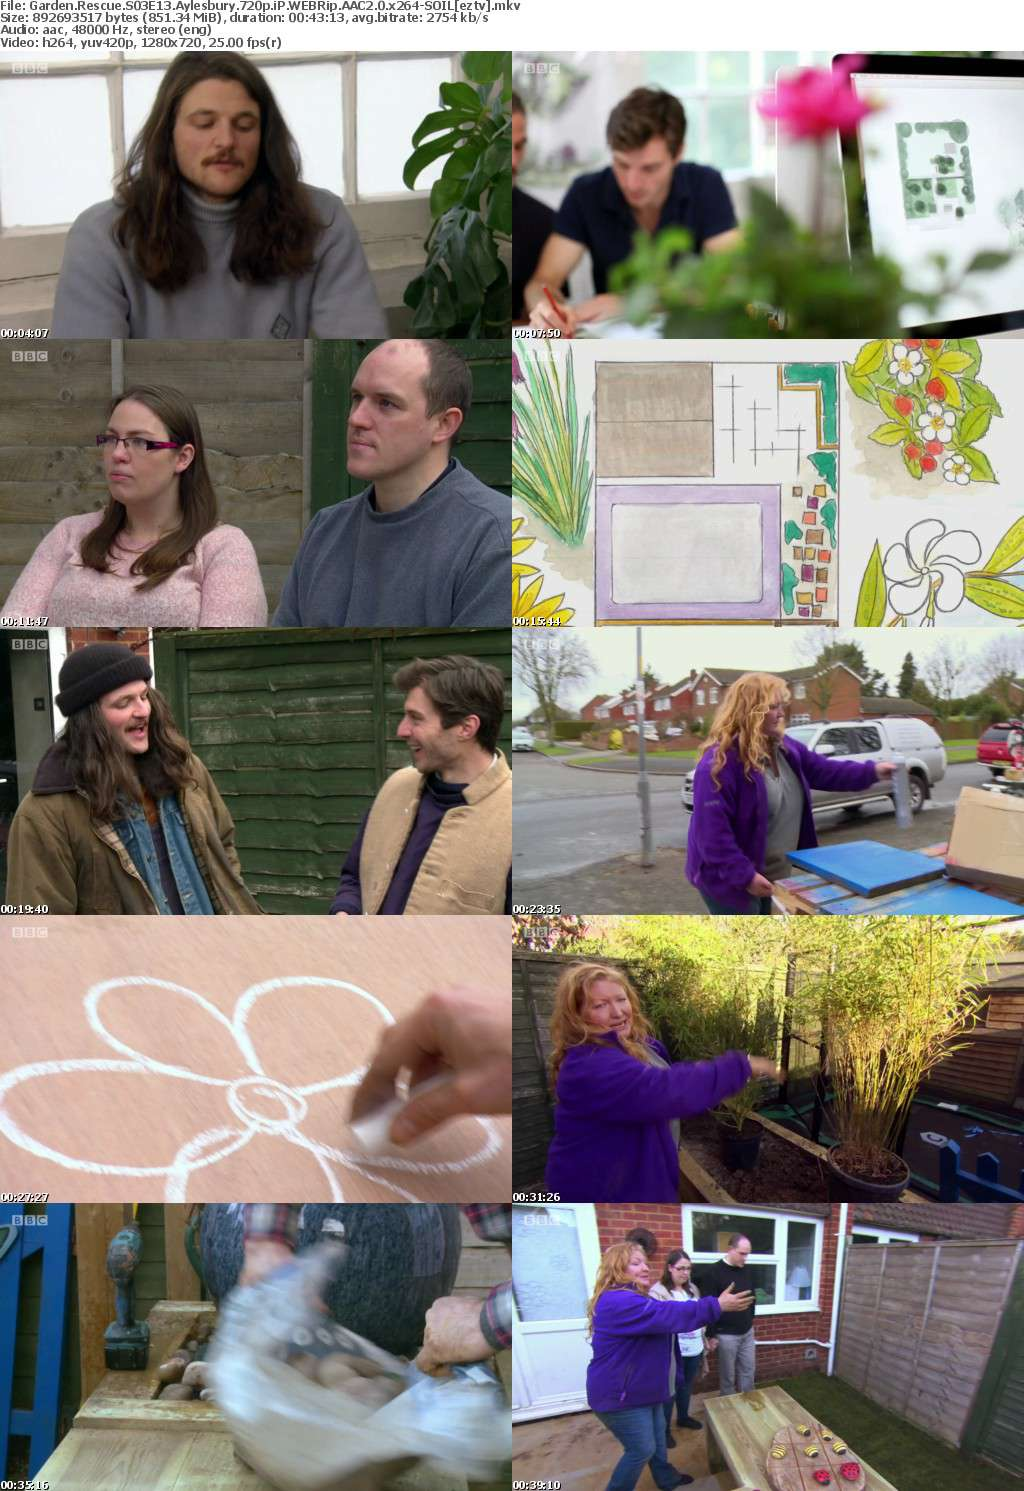 Garden Rescue S03E13 Aylesbury 720p iP WEBRip AAC2 0 x264-SOIL